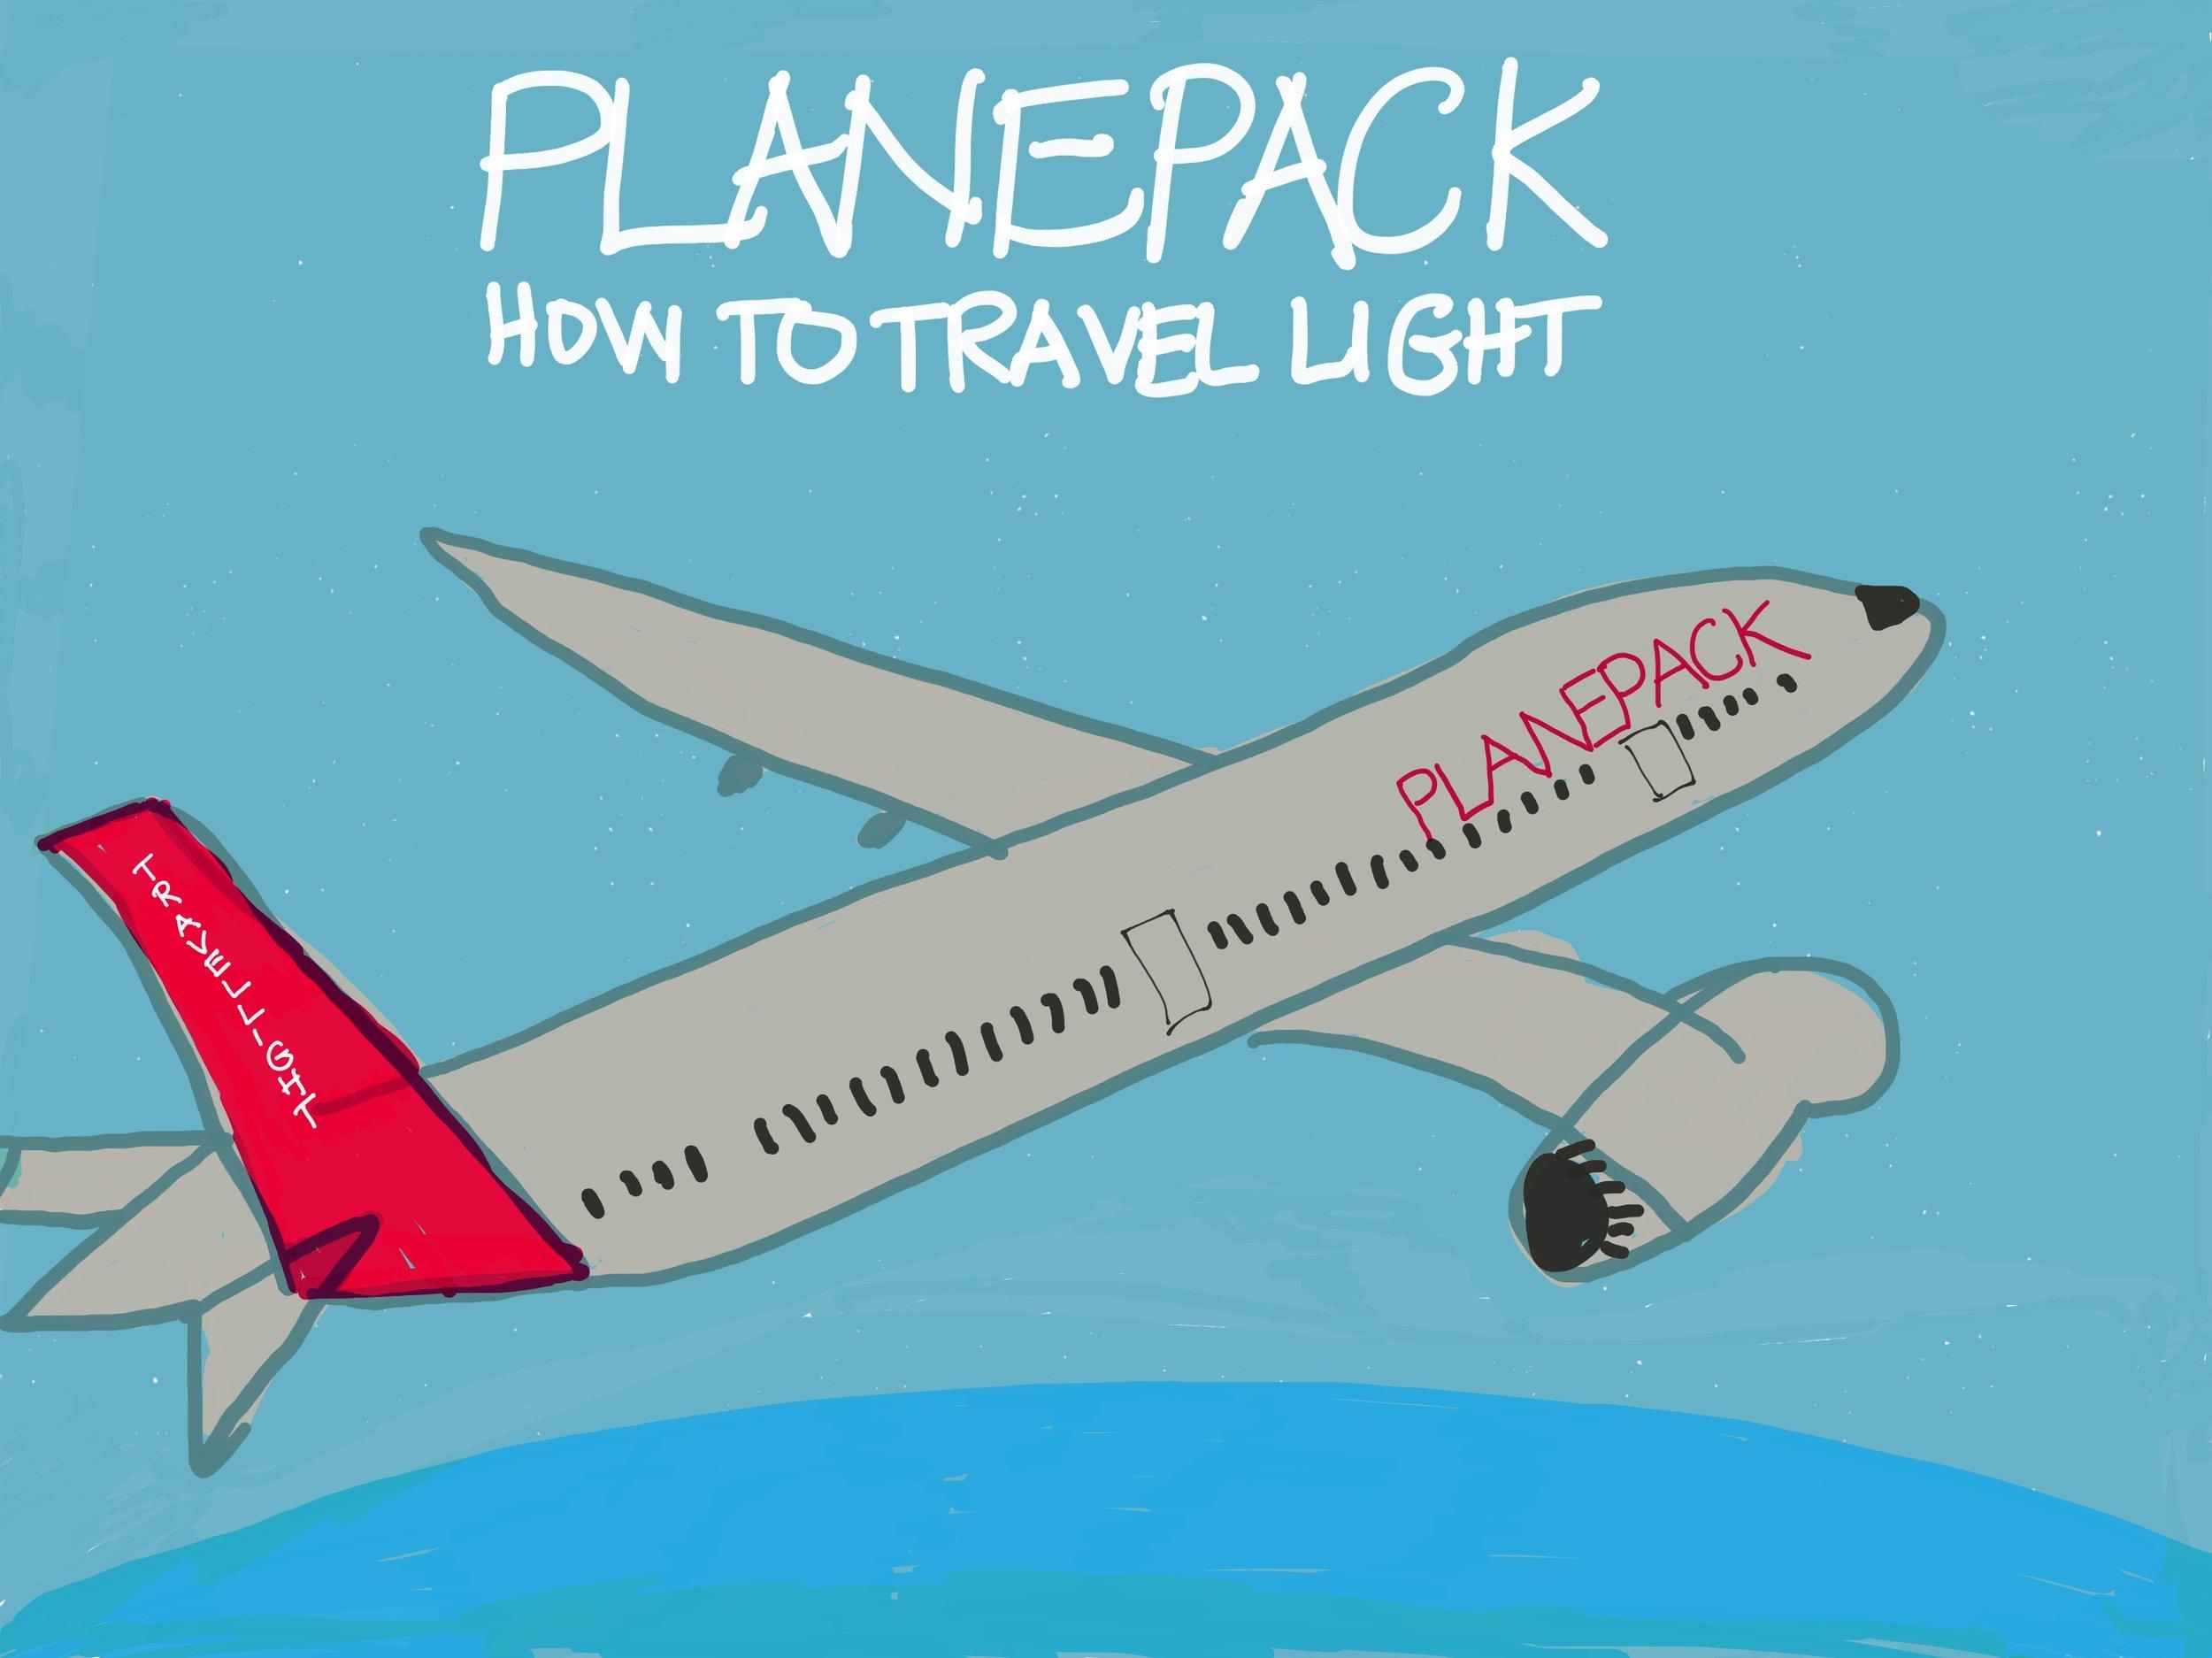 Travel light, the Planepack way